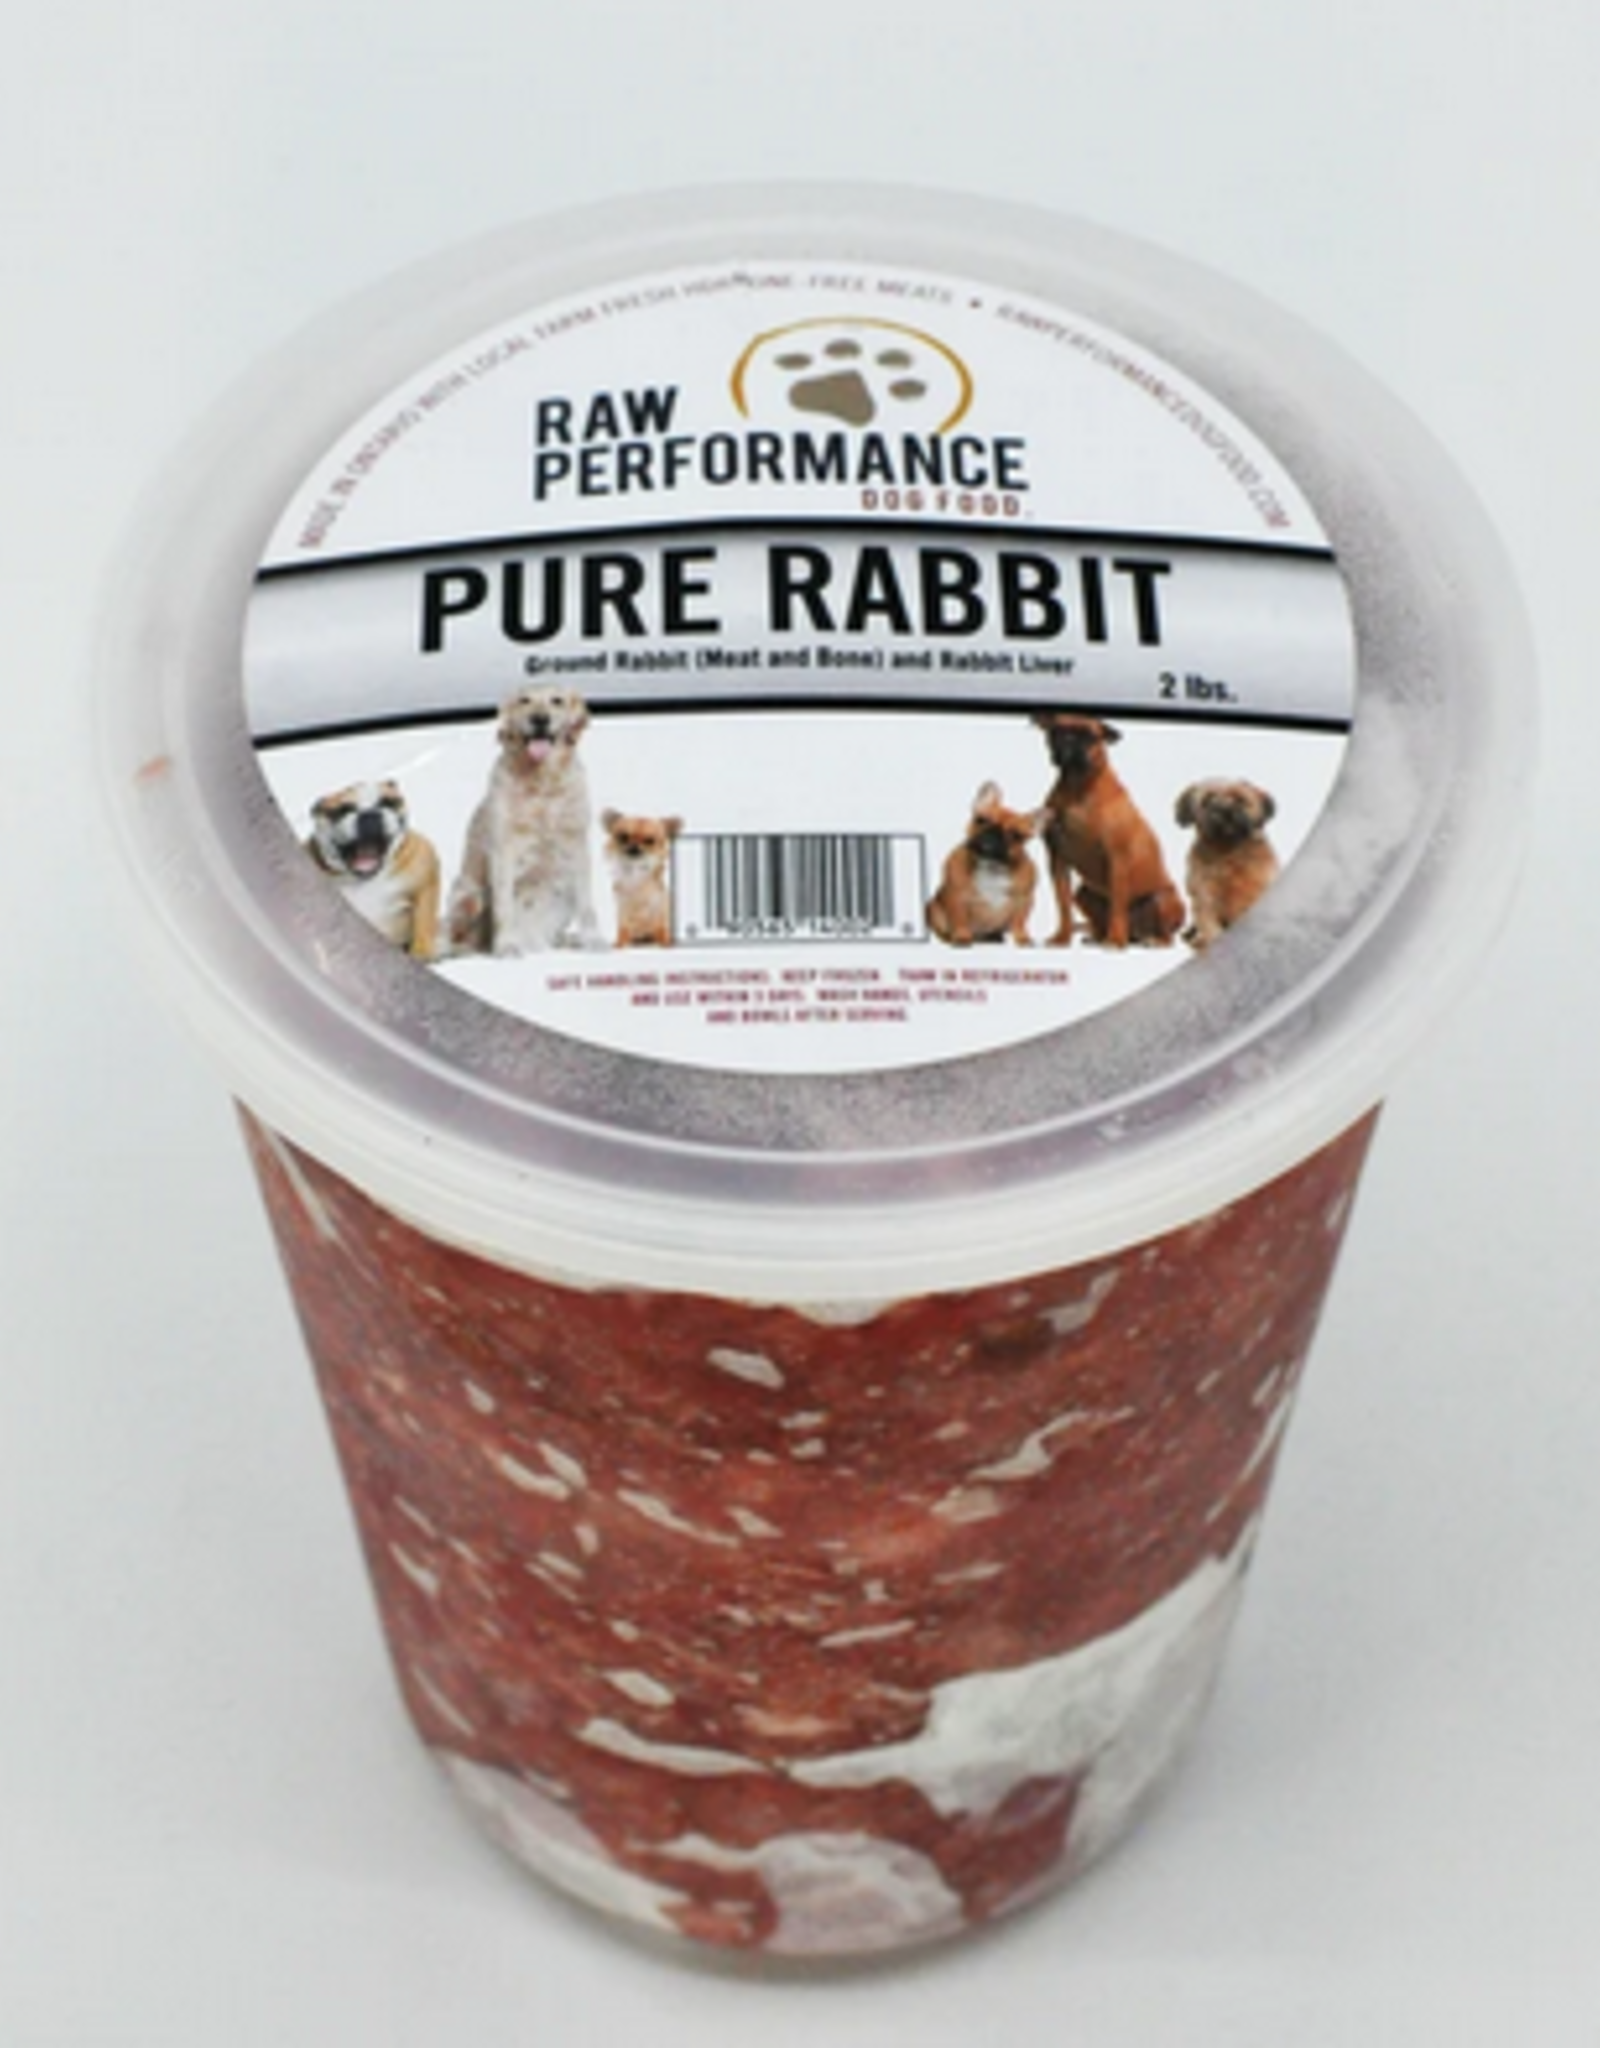 Raw Performance Raw Performance - Pure Rabbit 2lb